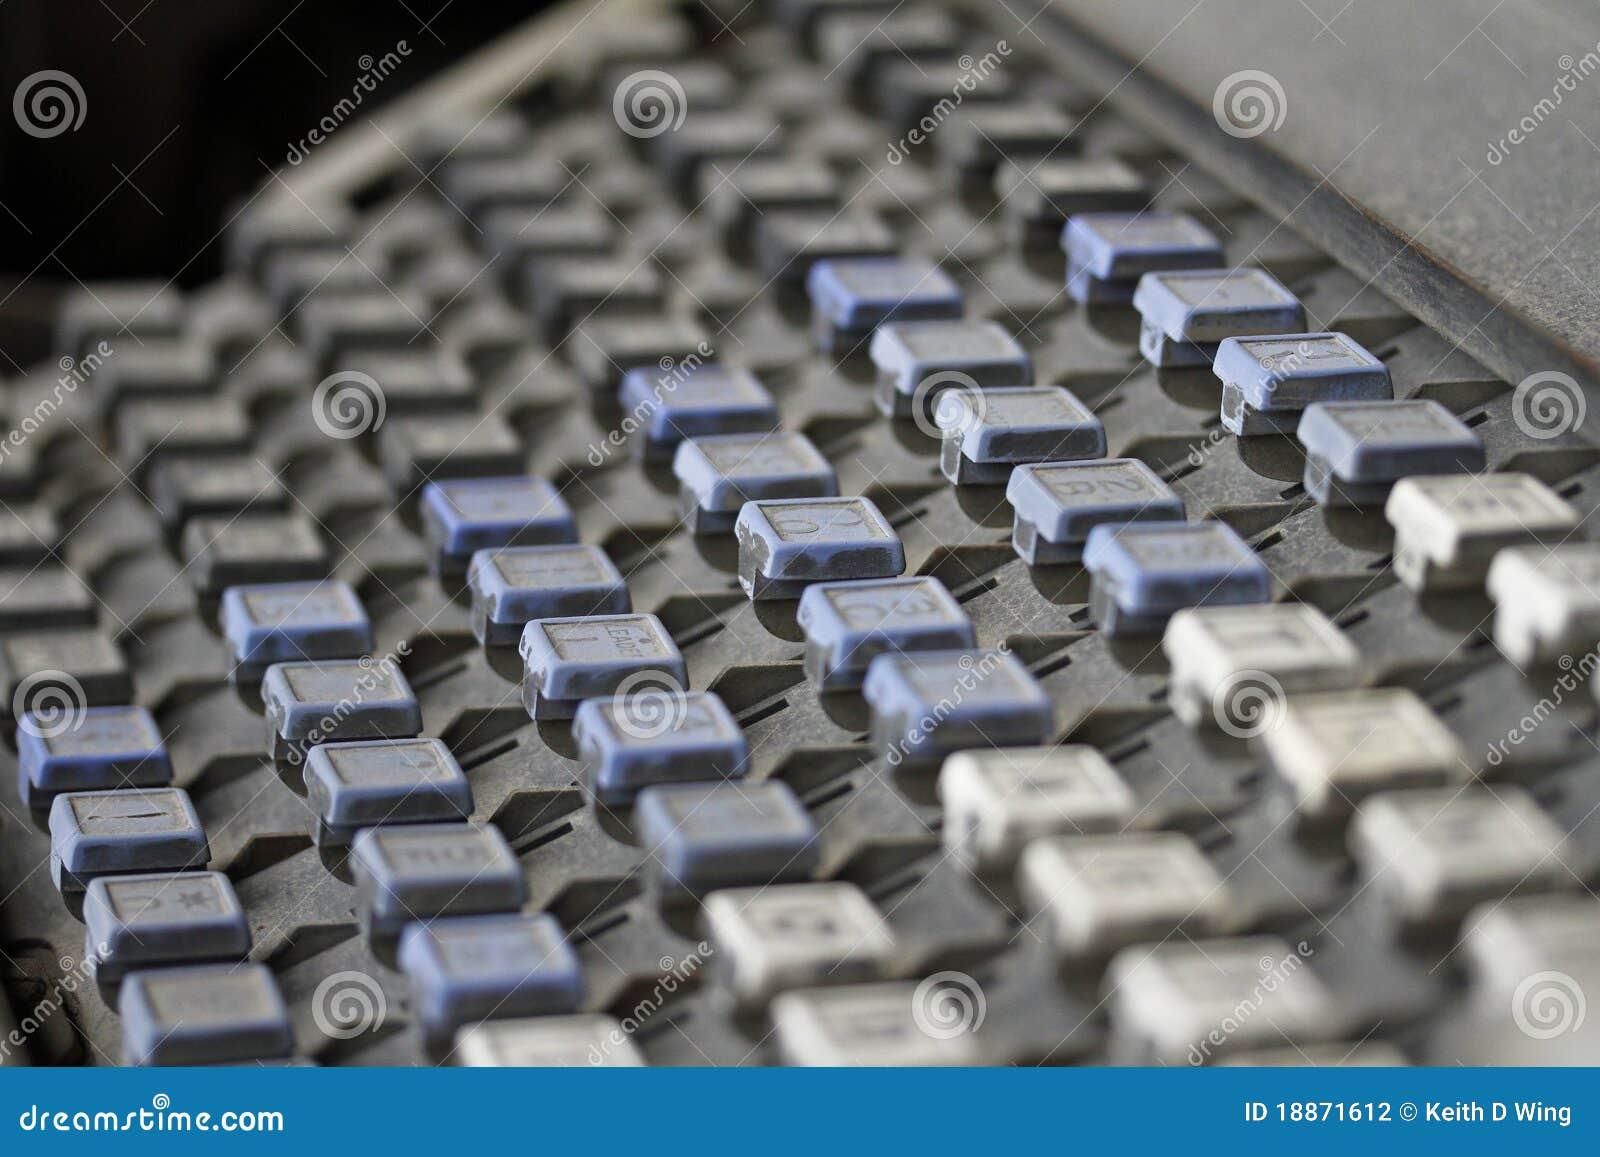 Linotype Keyboard stock photo  Image of mergenthaler - 18871612